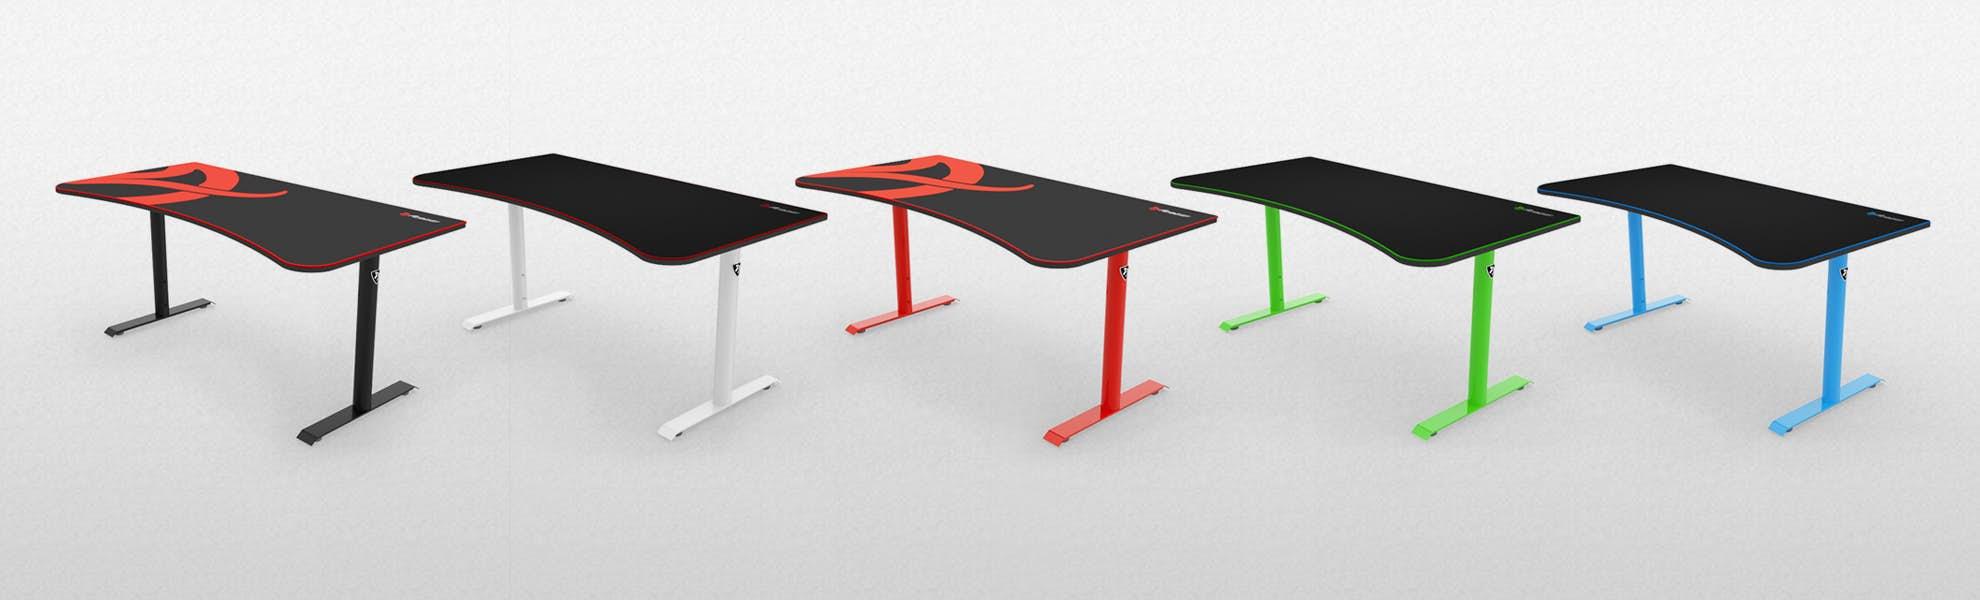 Massdrop: Arozzi Gaming Desk - $249 (limited qty)